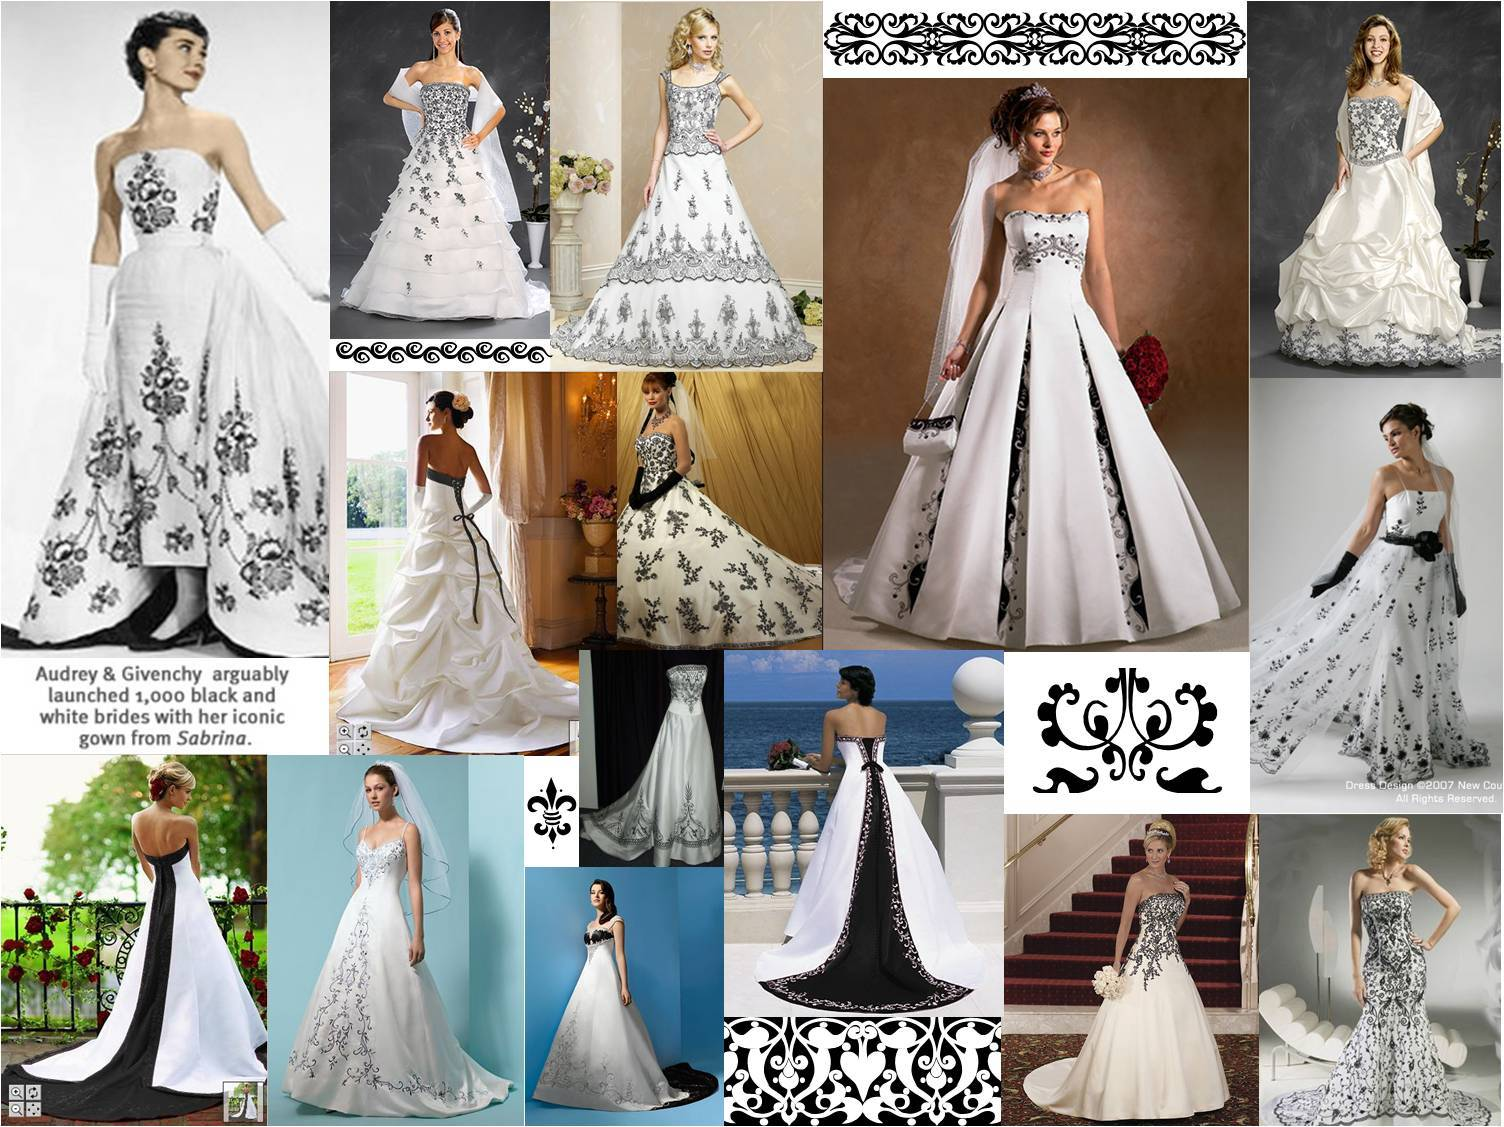 Audrey Hepburn Wedding Dress Pattern